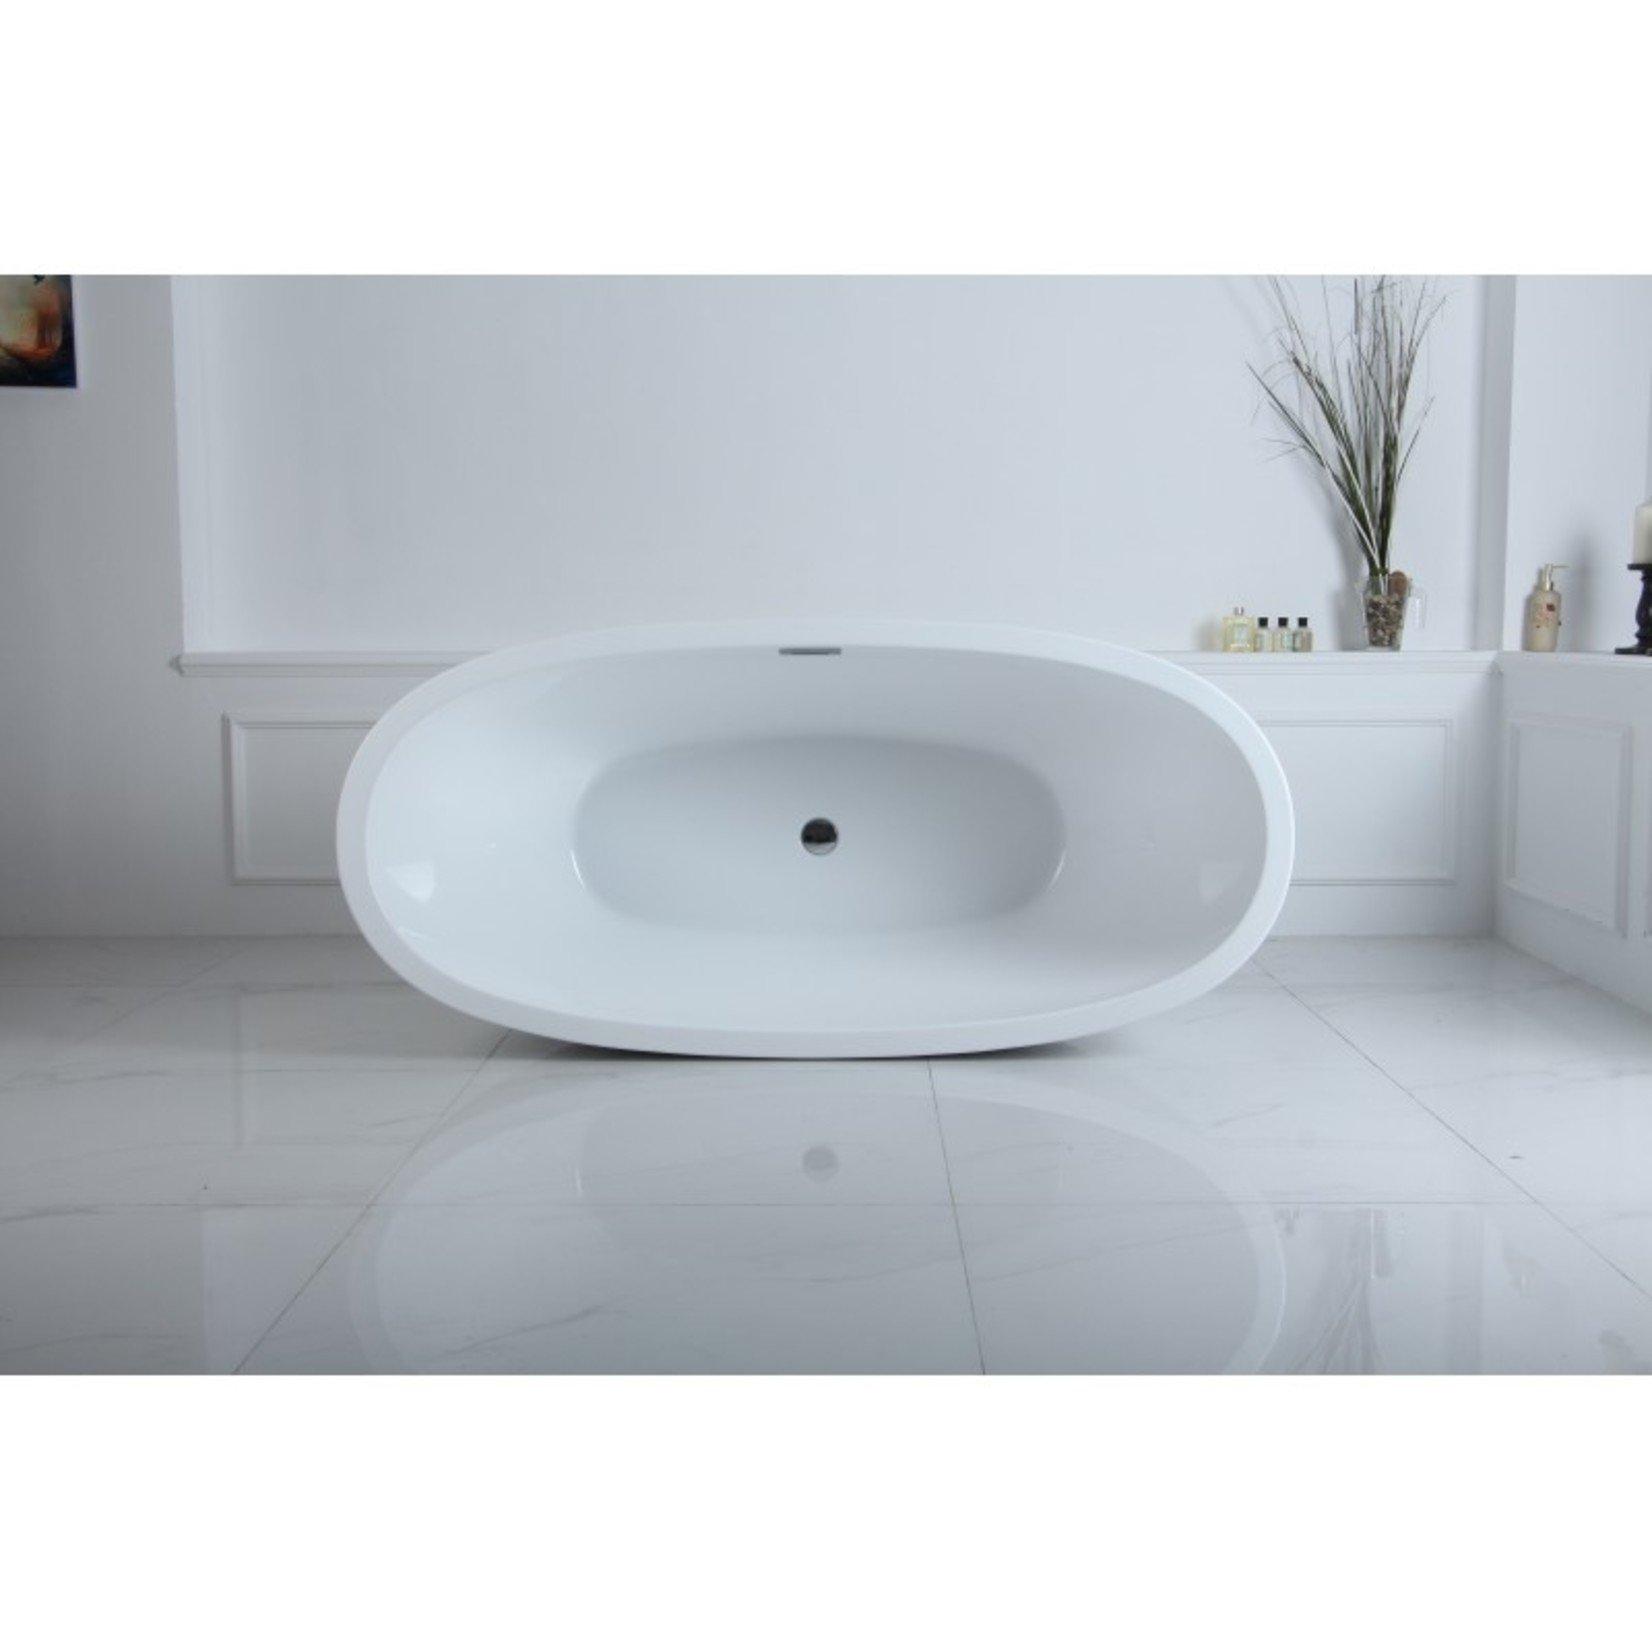 Amon 67 '' freestanding bathtub white DI-02588